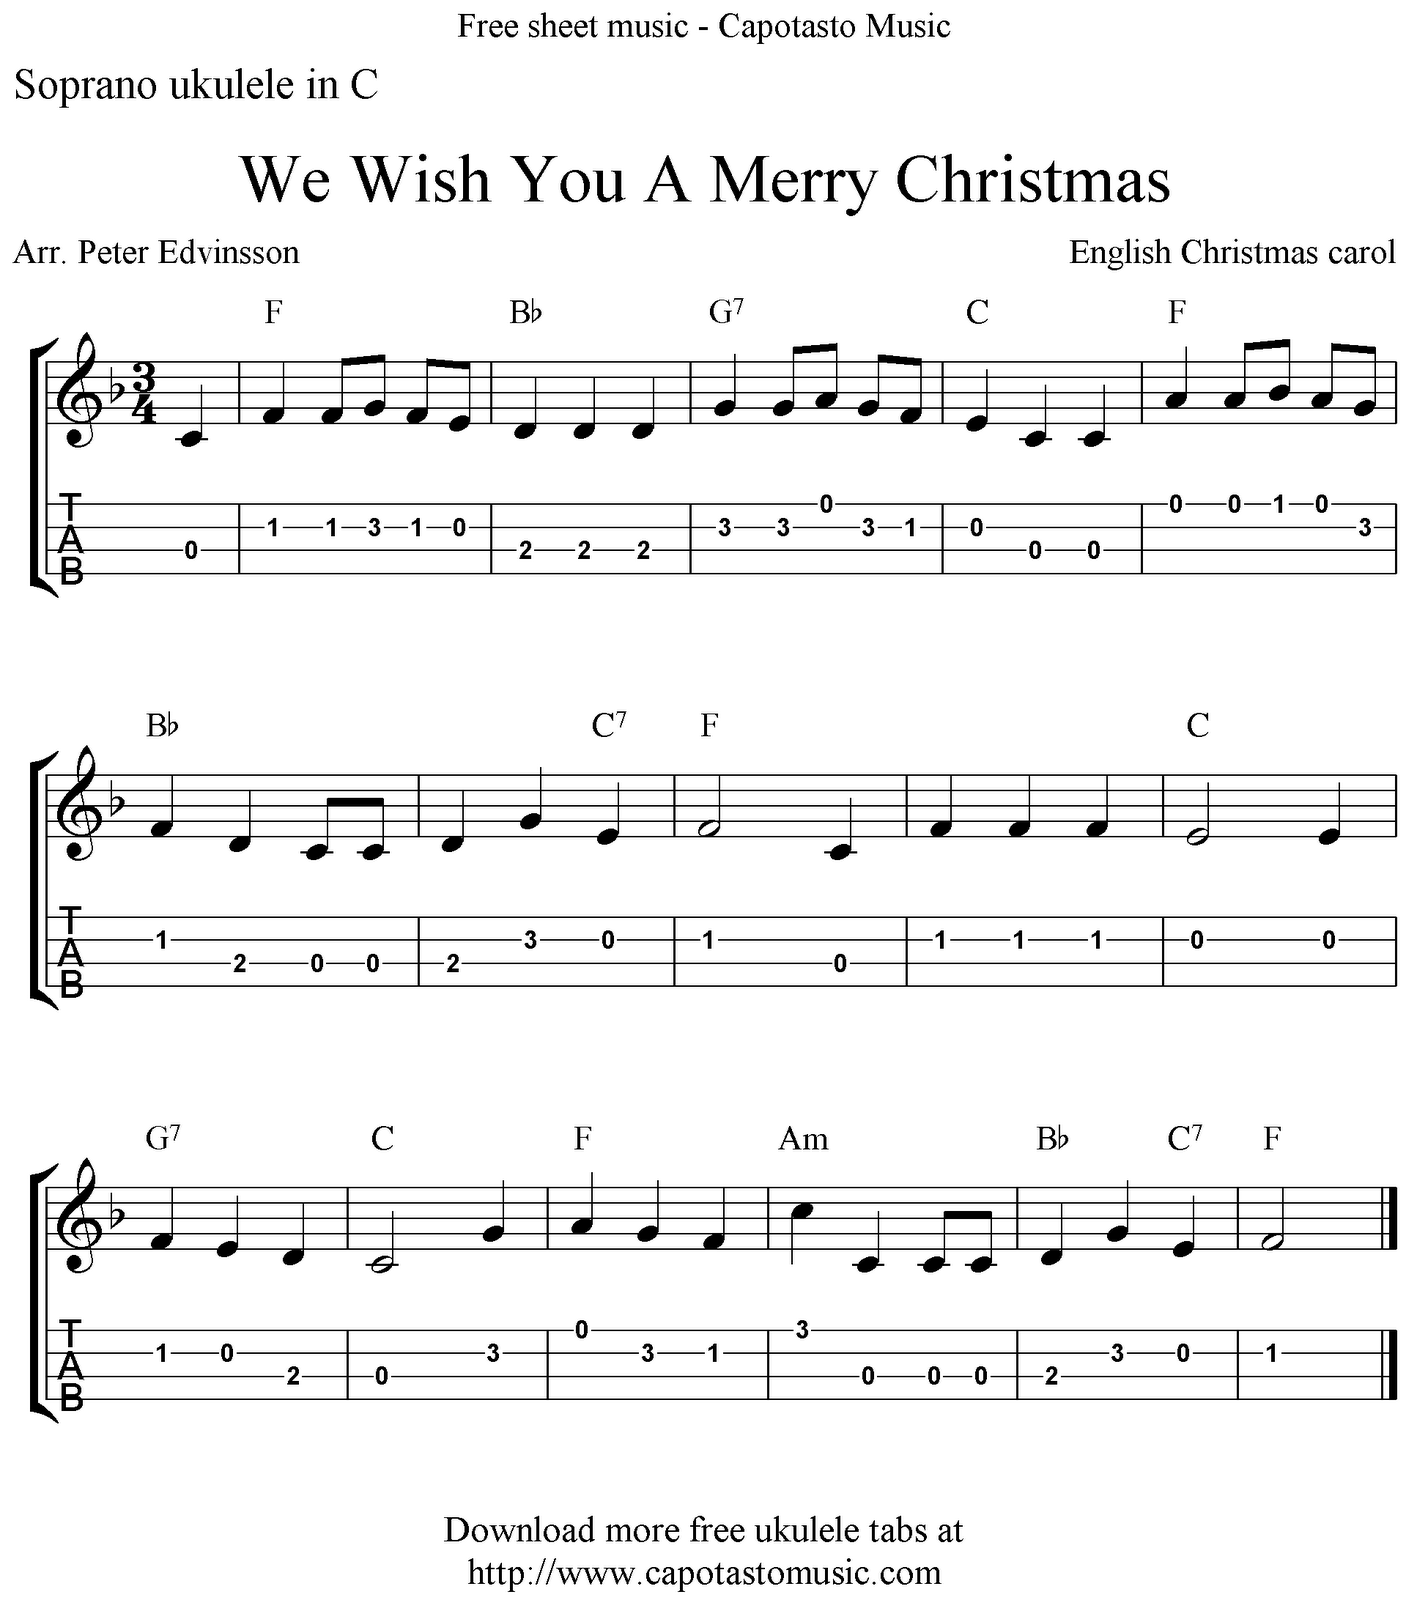 We Wish You A Merry Christmas, free Christmas ukulele tabs